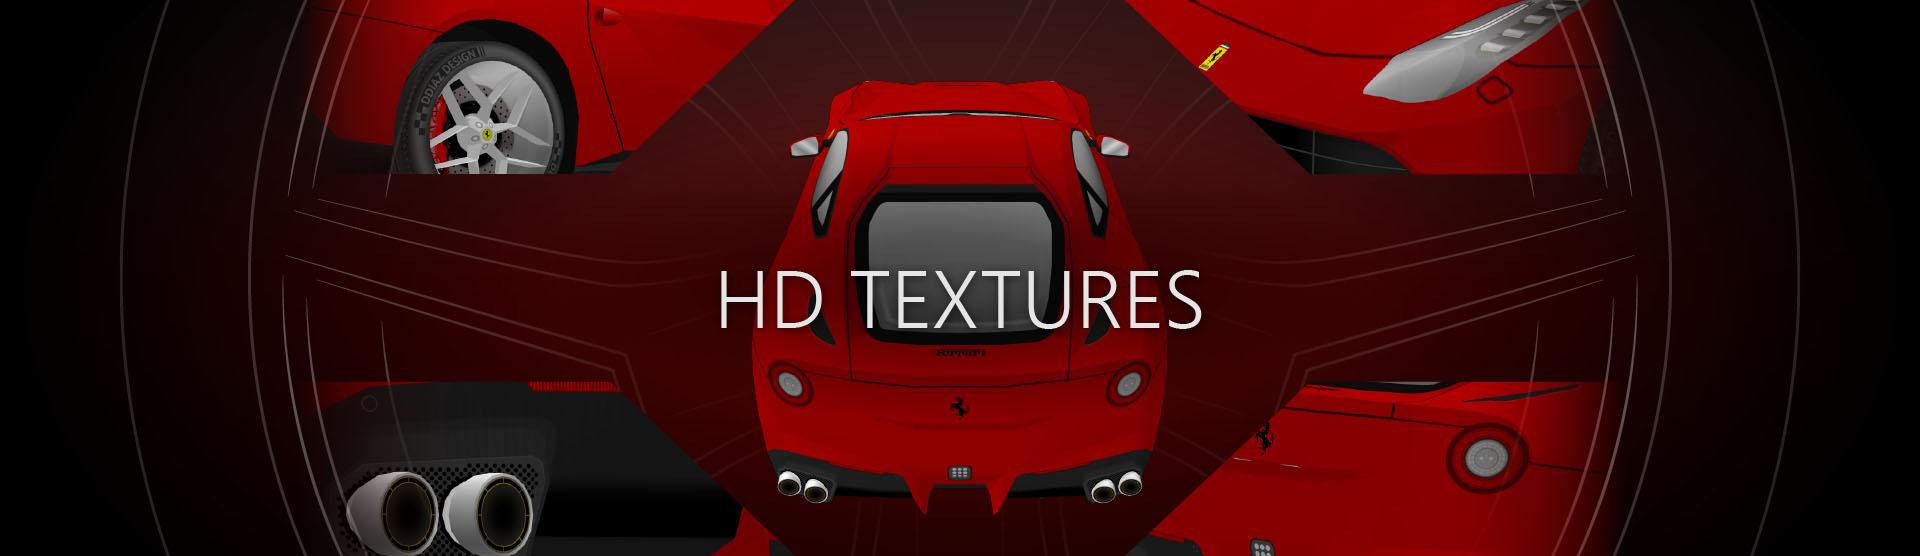 F12 Download Texture